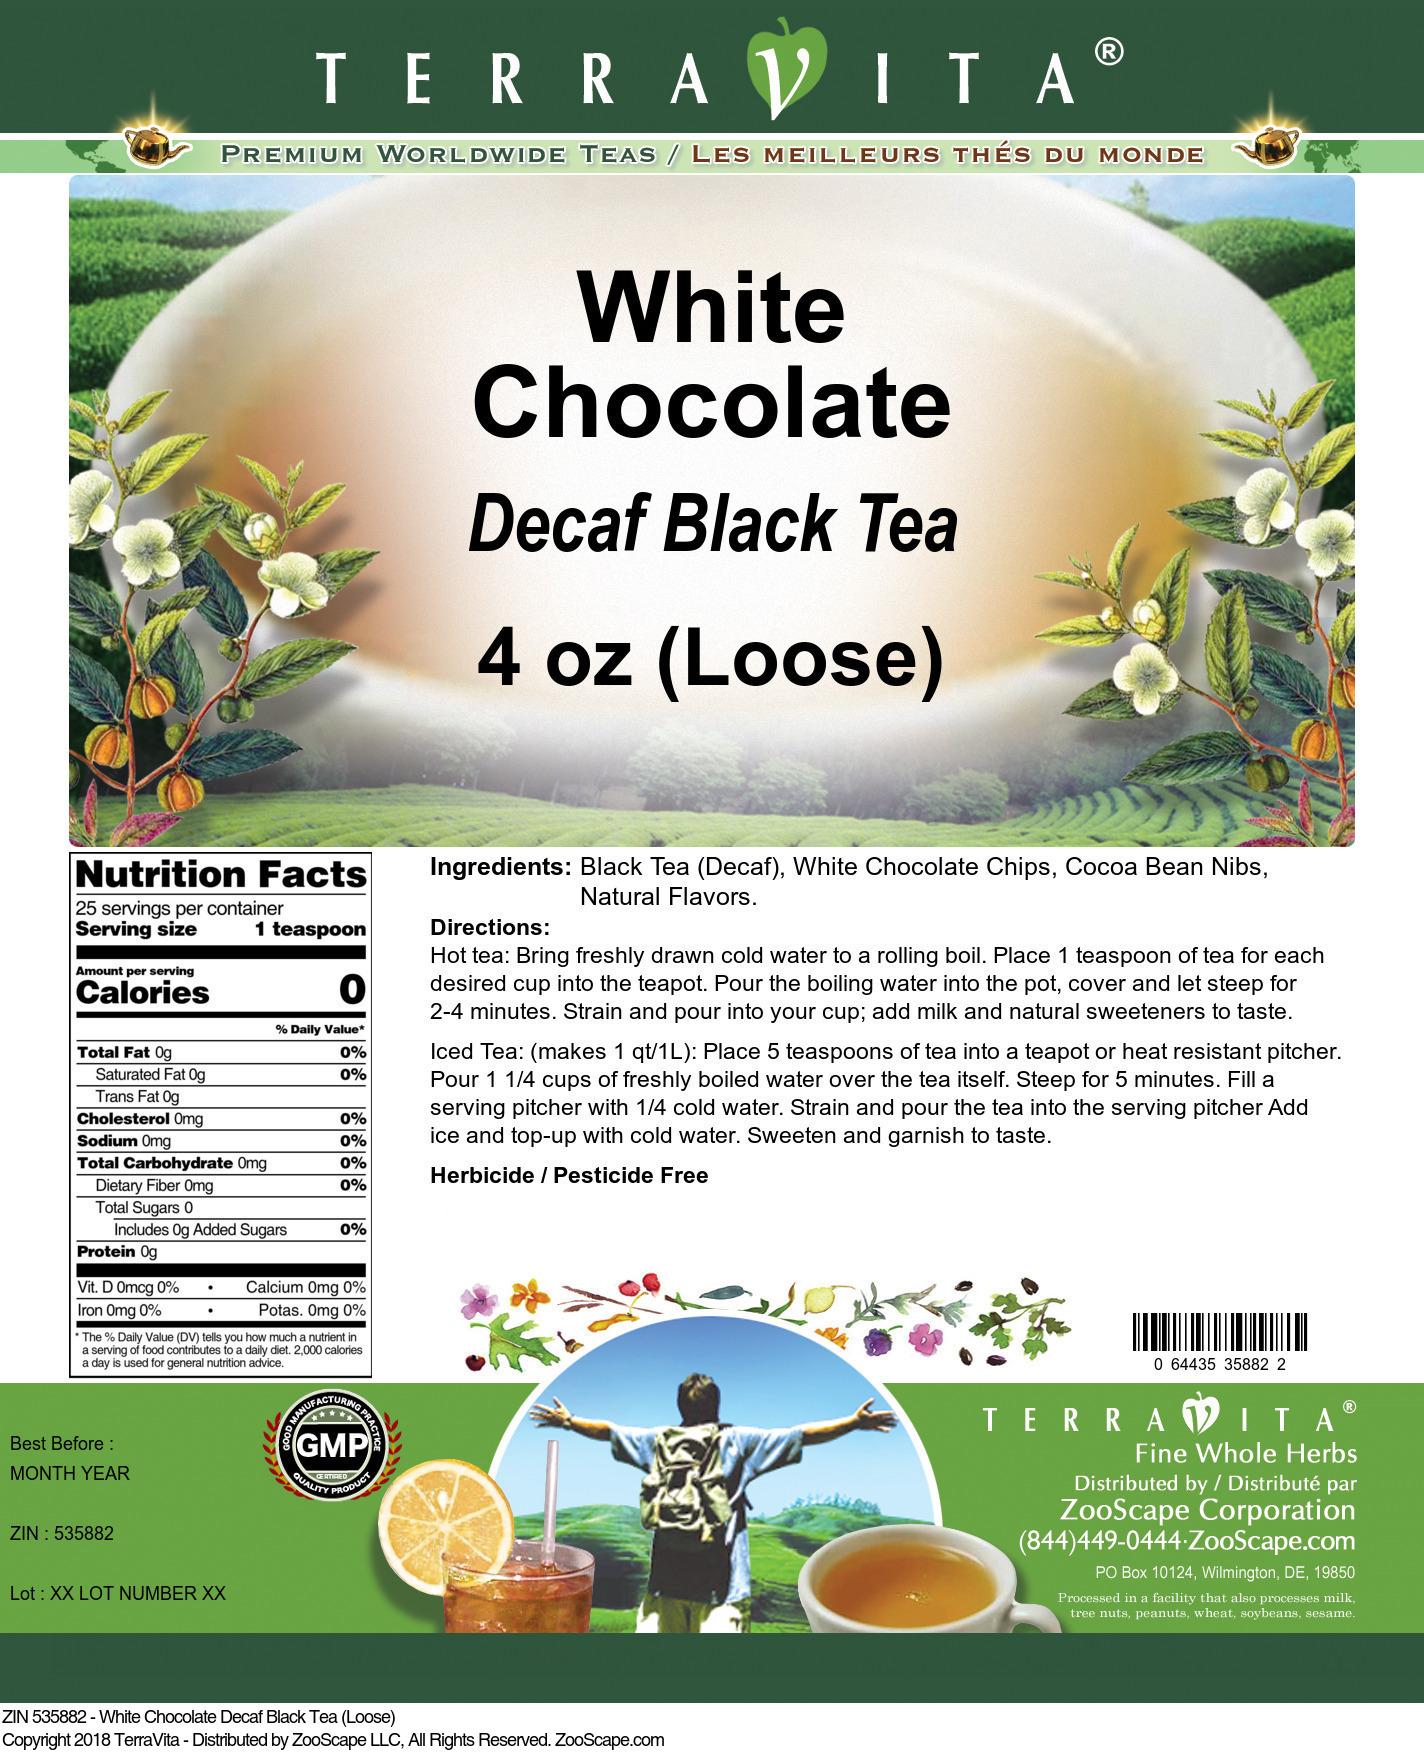 White Chocolate Decaf Black Tea